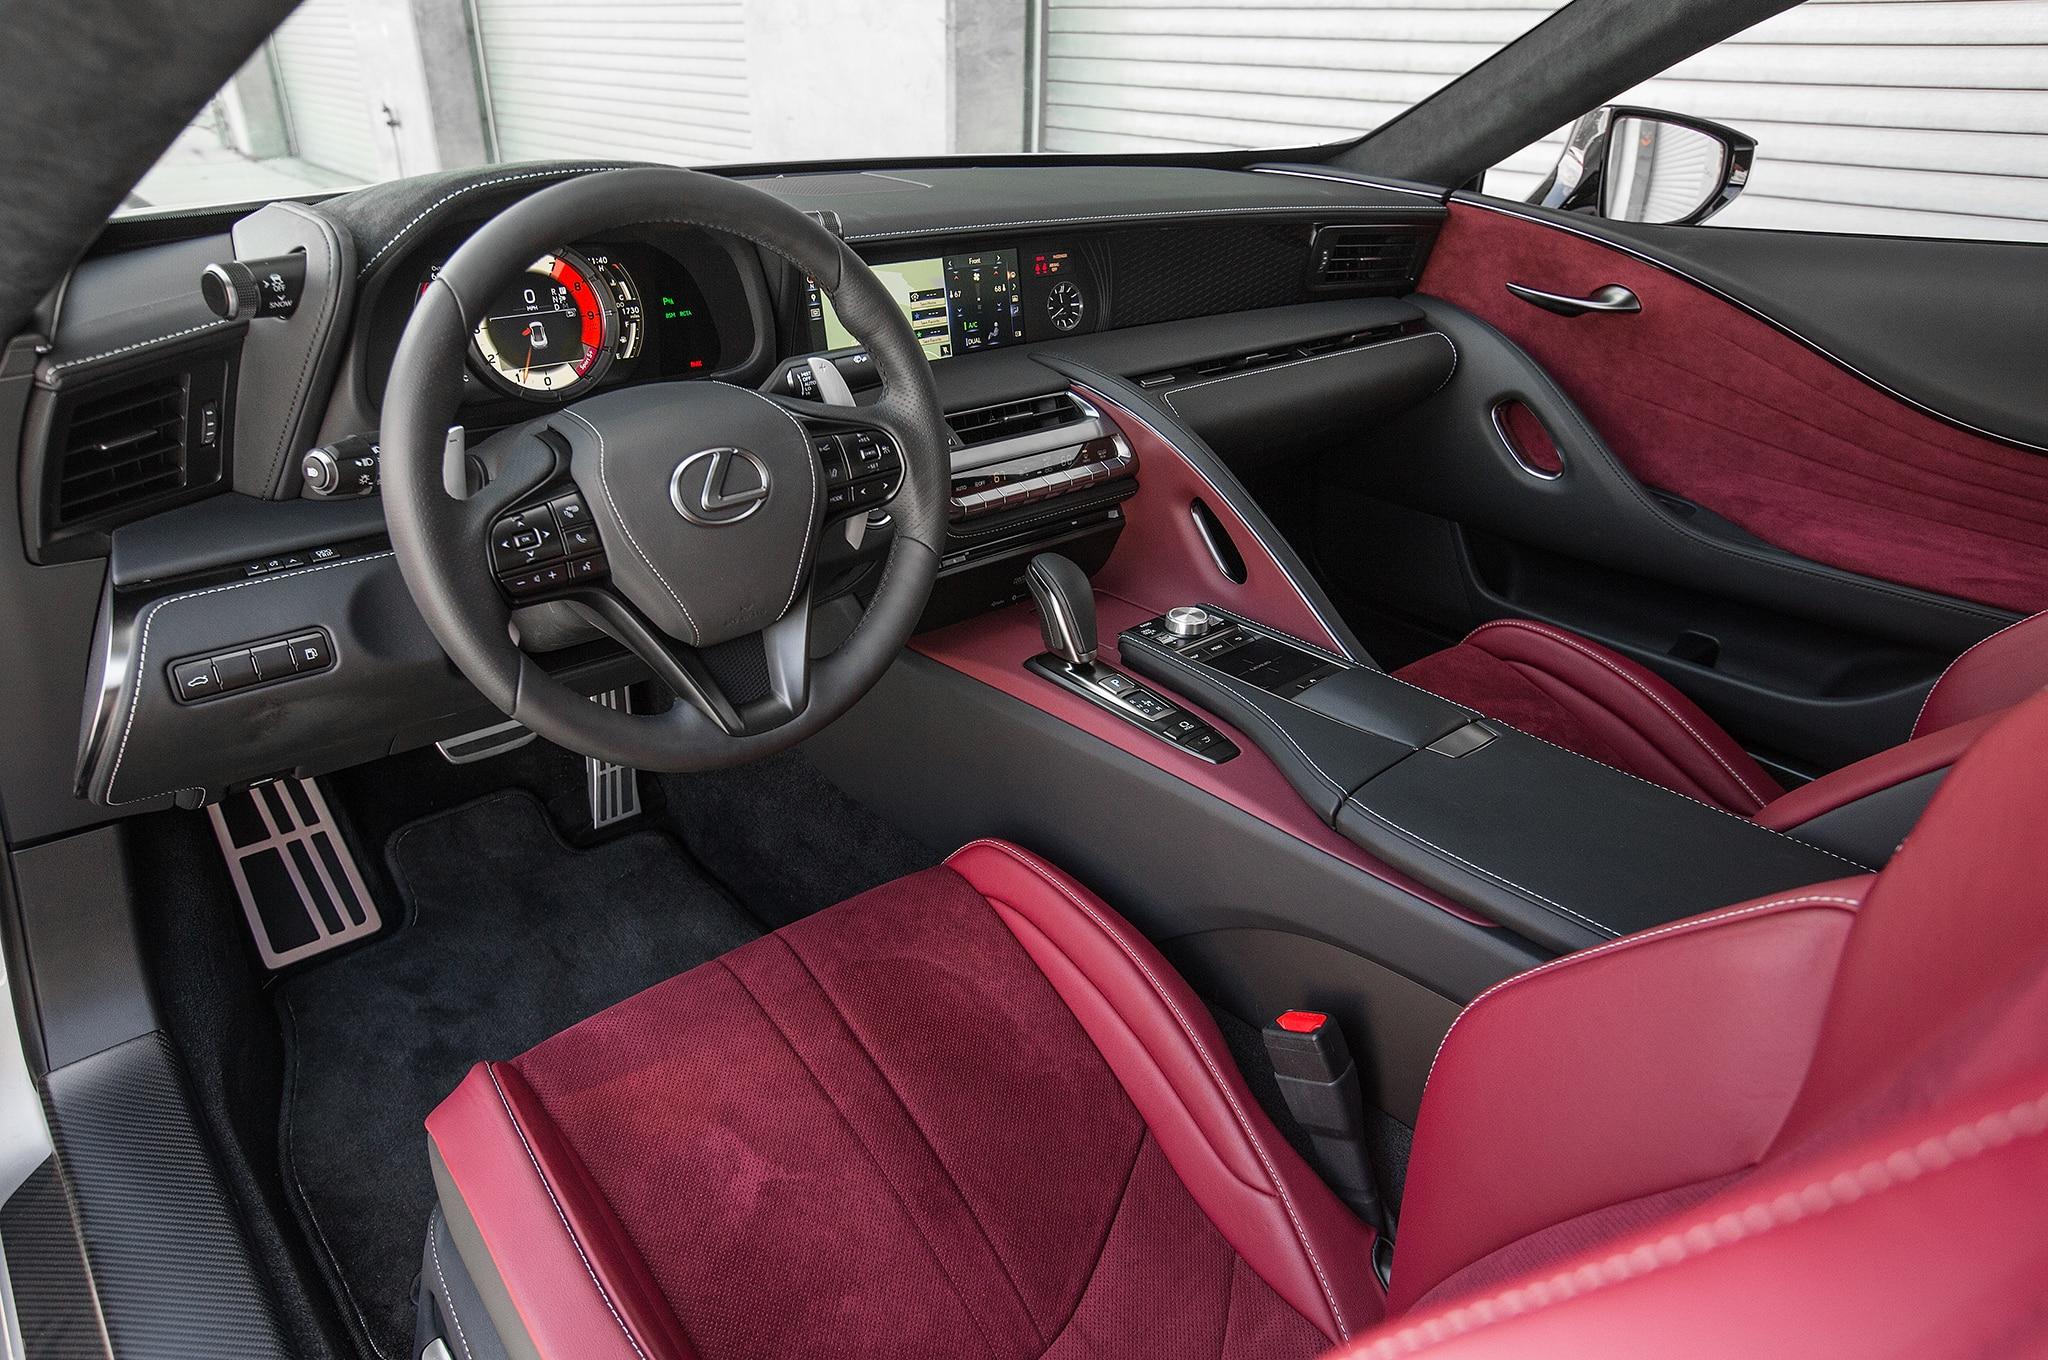 2018 Lexus Lc 500 Interior Detail Motor Trend En Espa 241 Ol